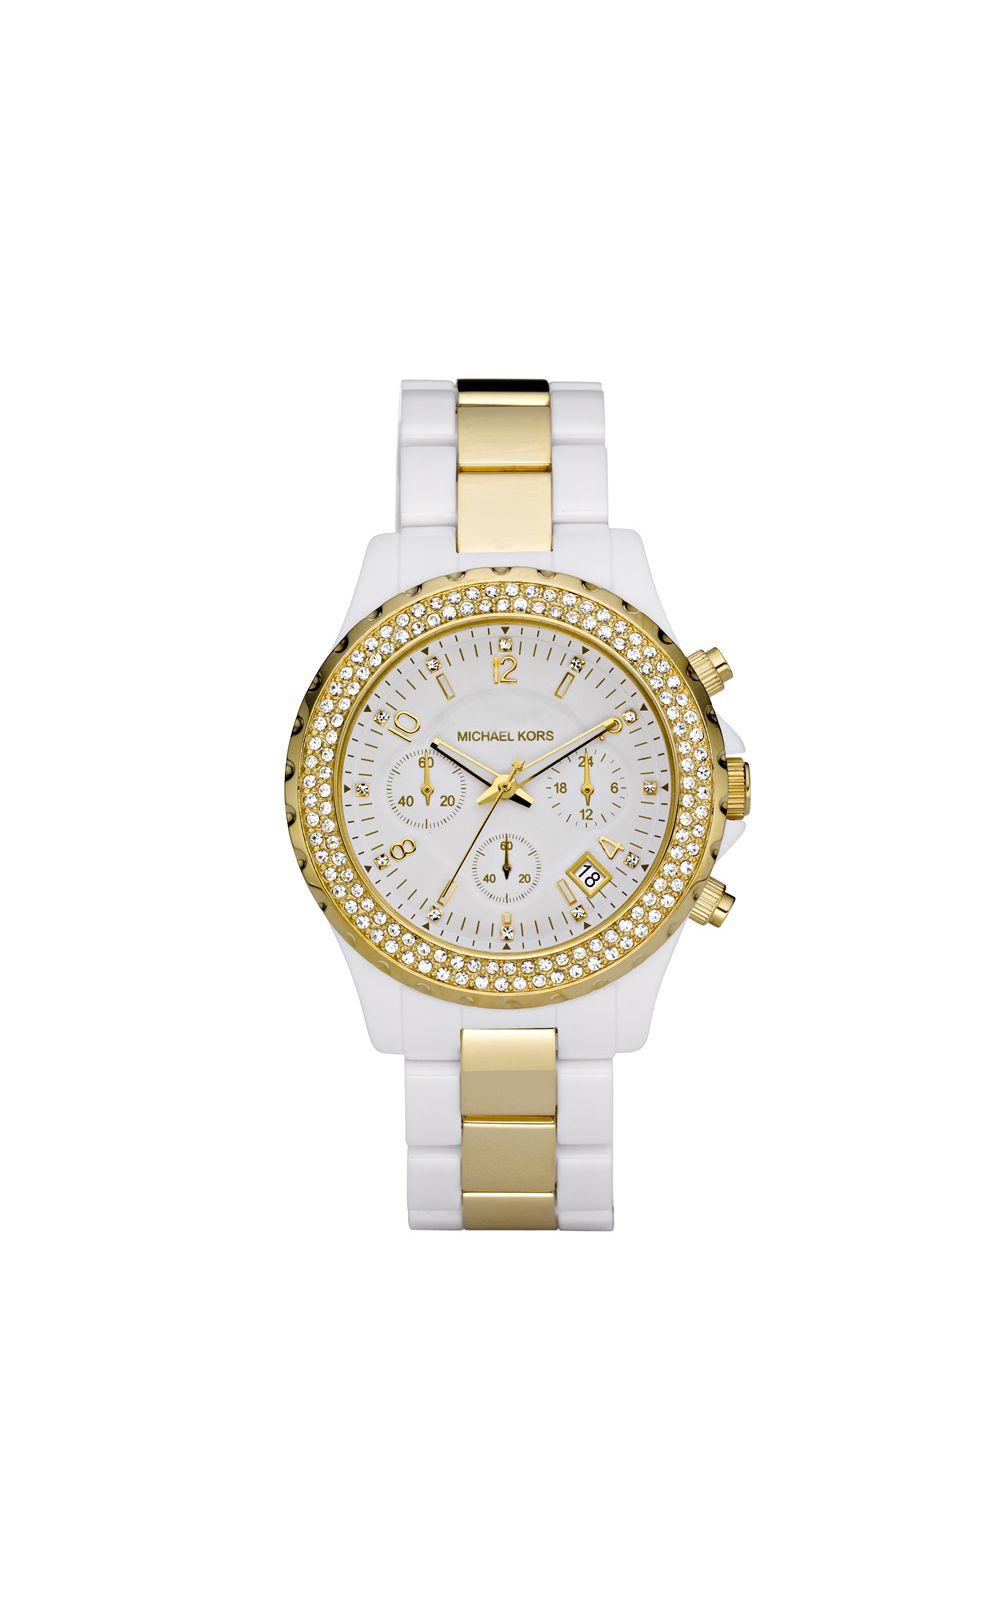 793332506 Relógio Michael Kors Feminino Branco e Dourado - OMK5355/N | Opte+